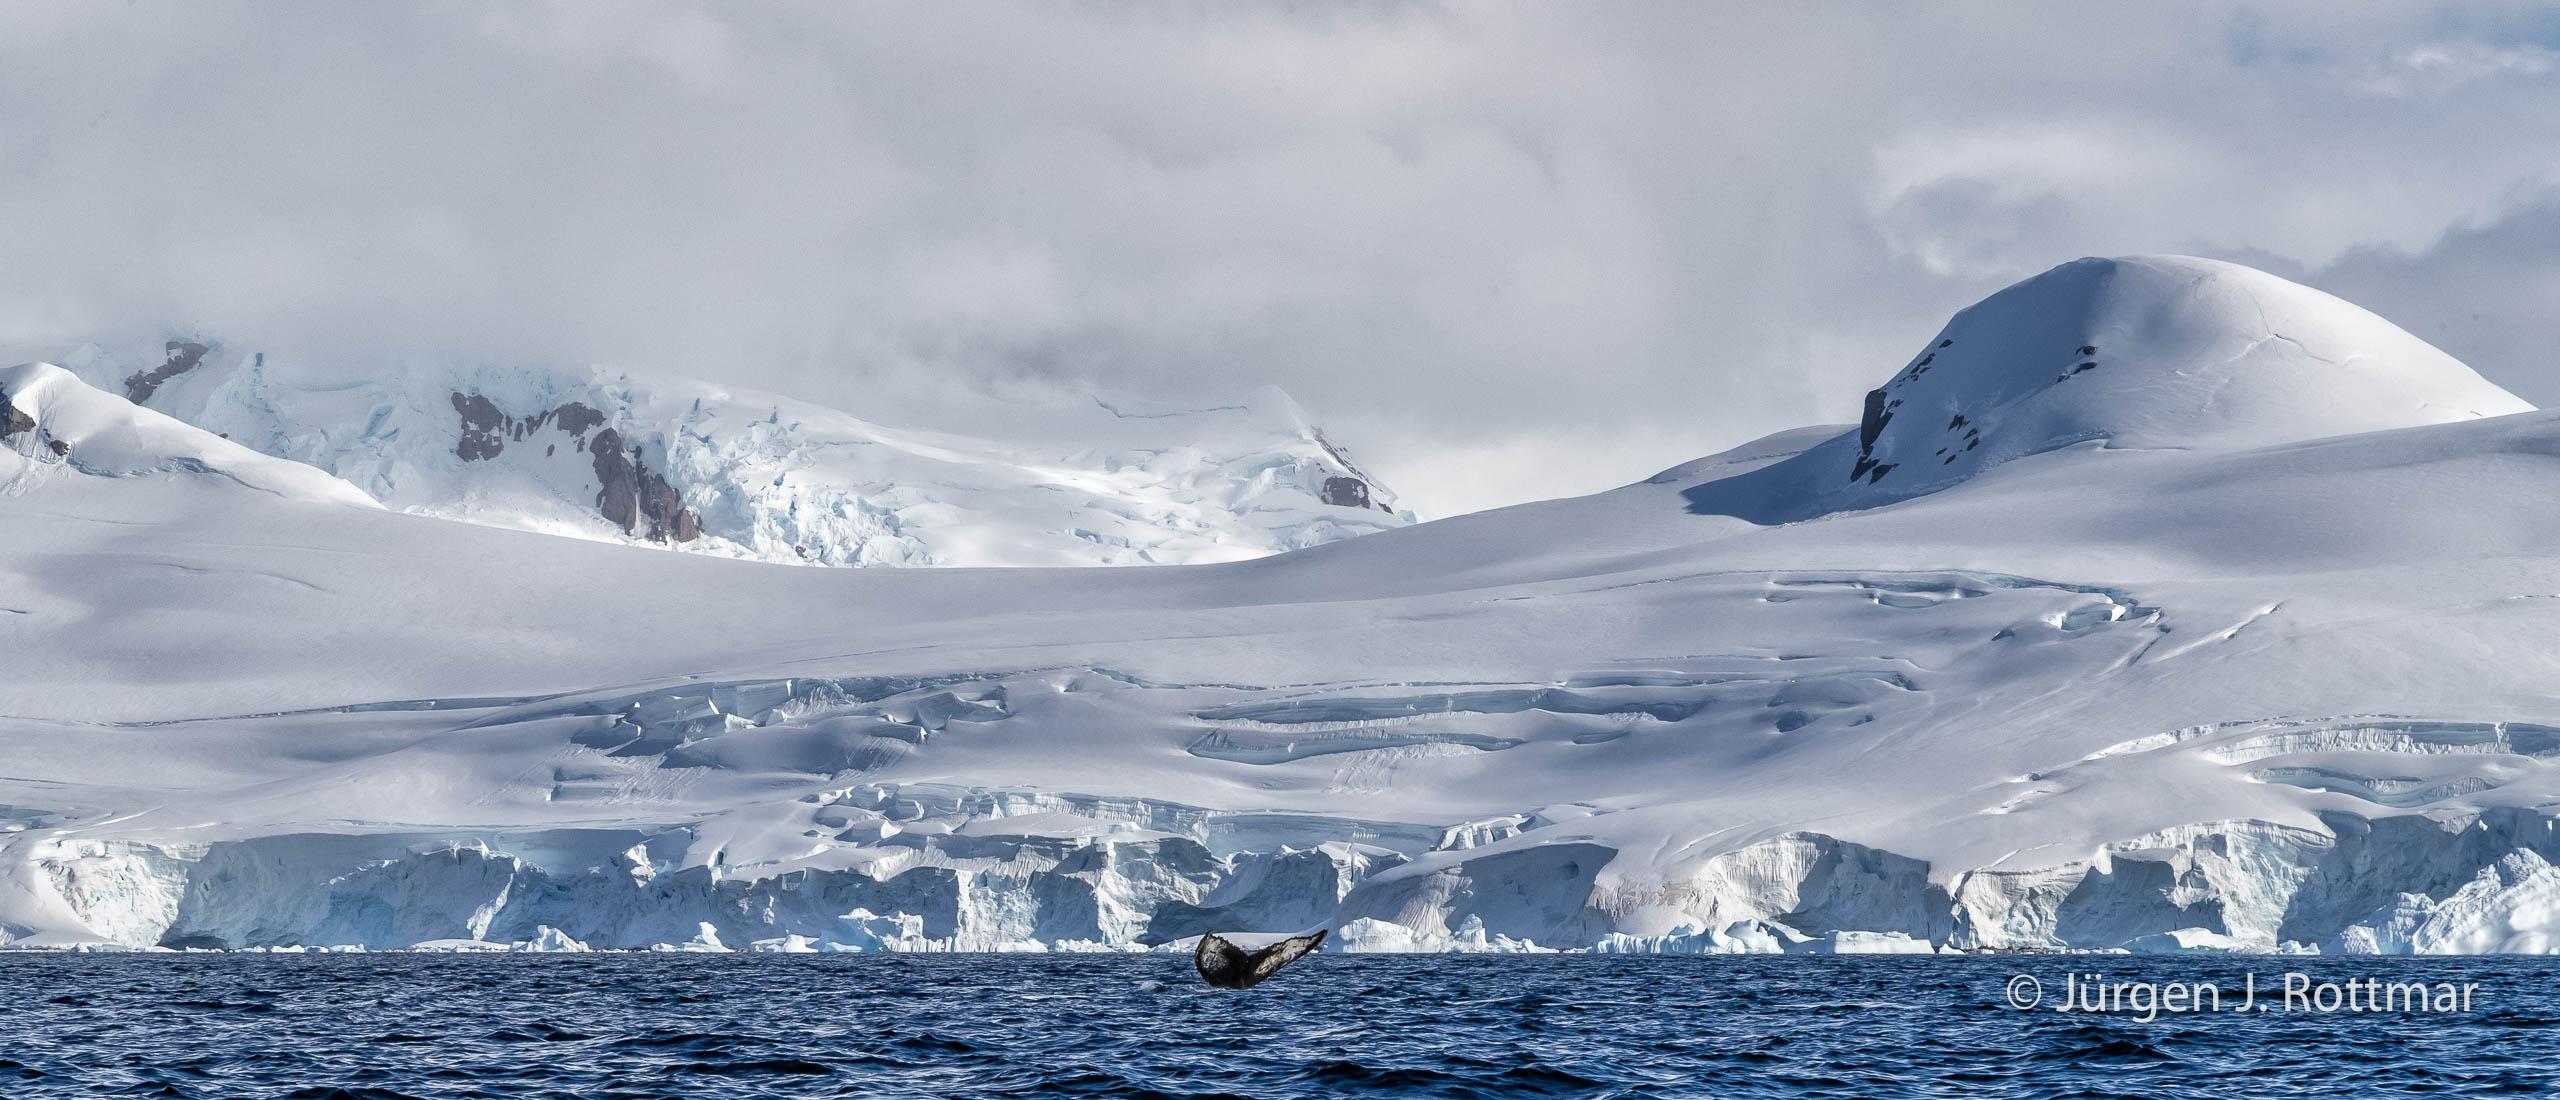 Juergen J Rottmar Antarctic Peninsula M2I1289 Bearbeitet